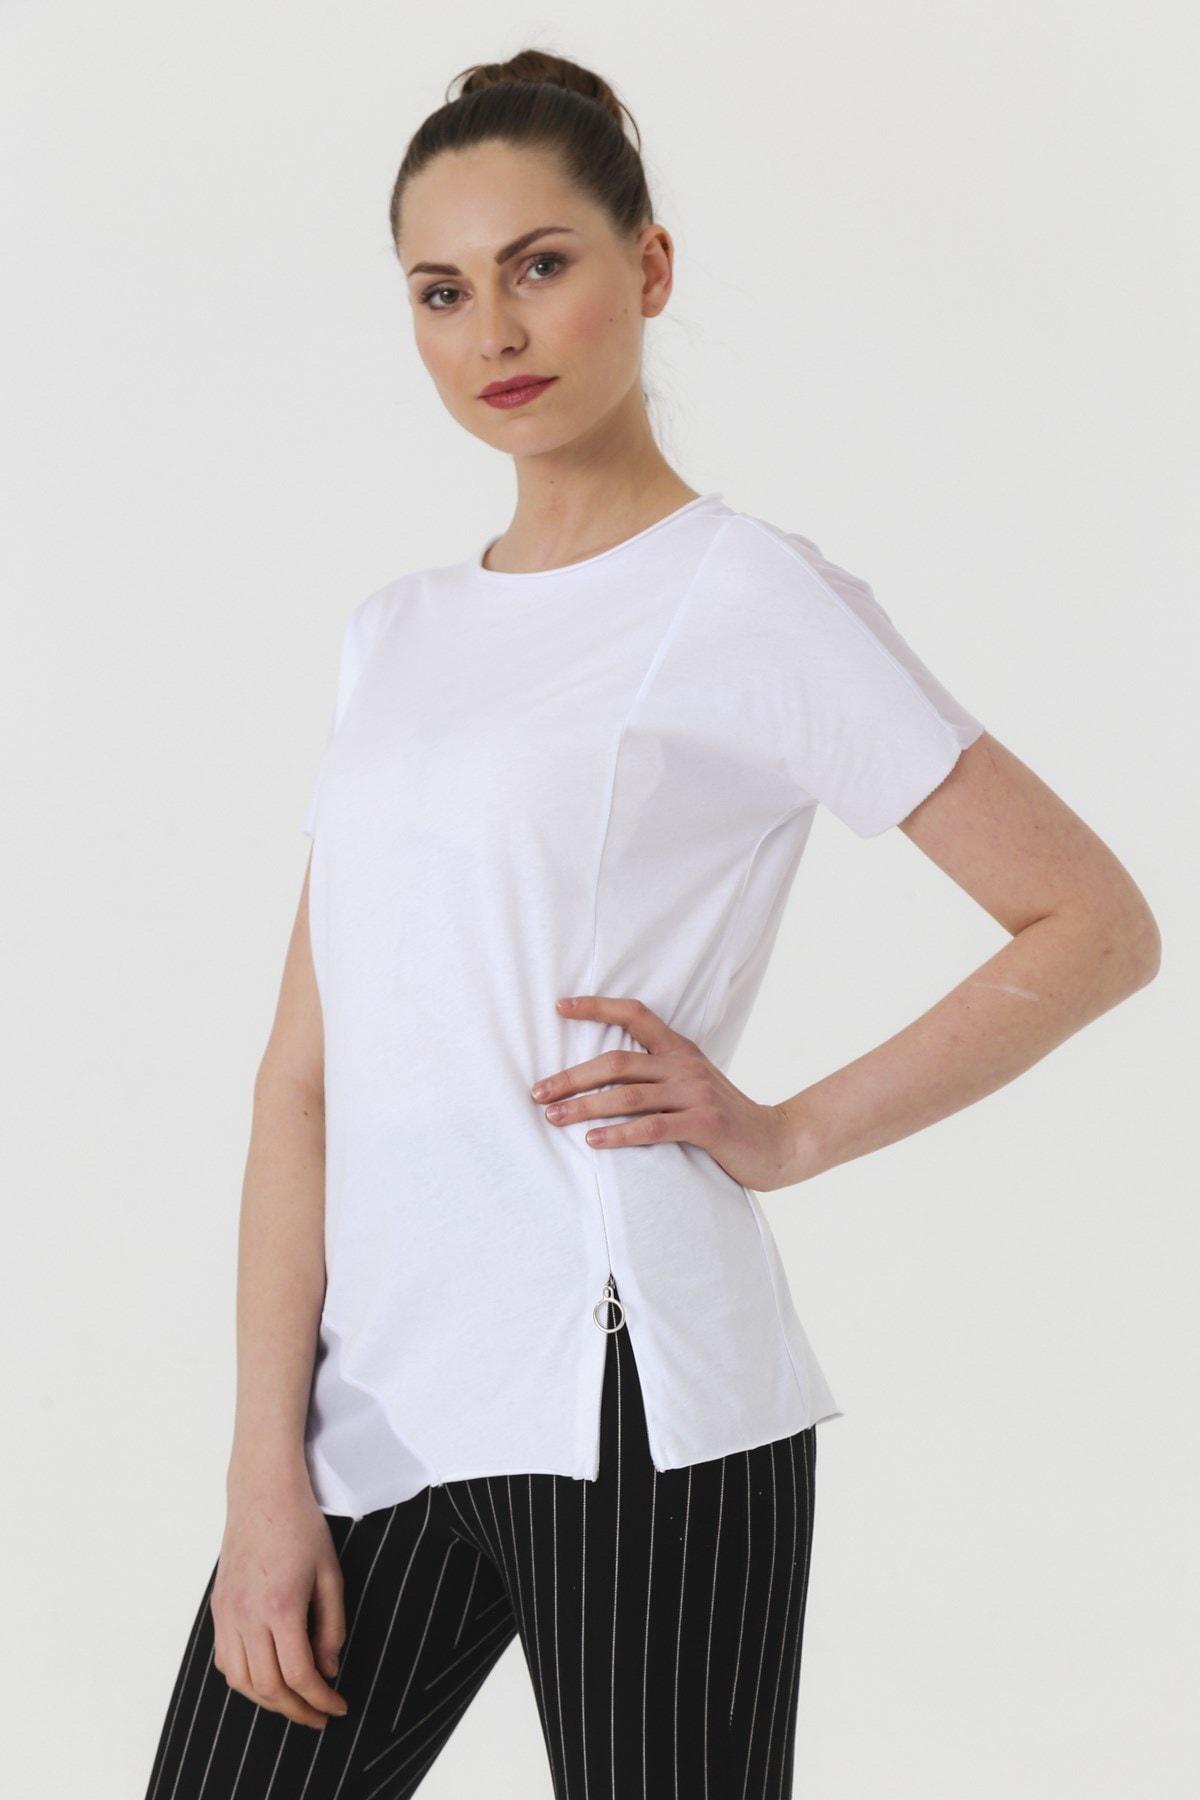 Jument Kadın Beyaz T-shirt 7095 1